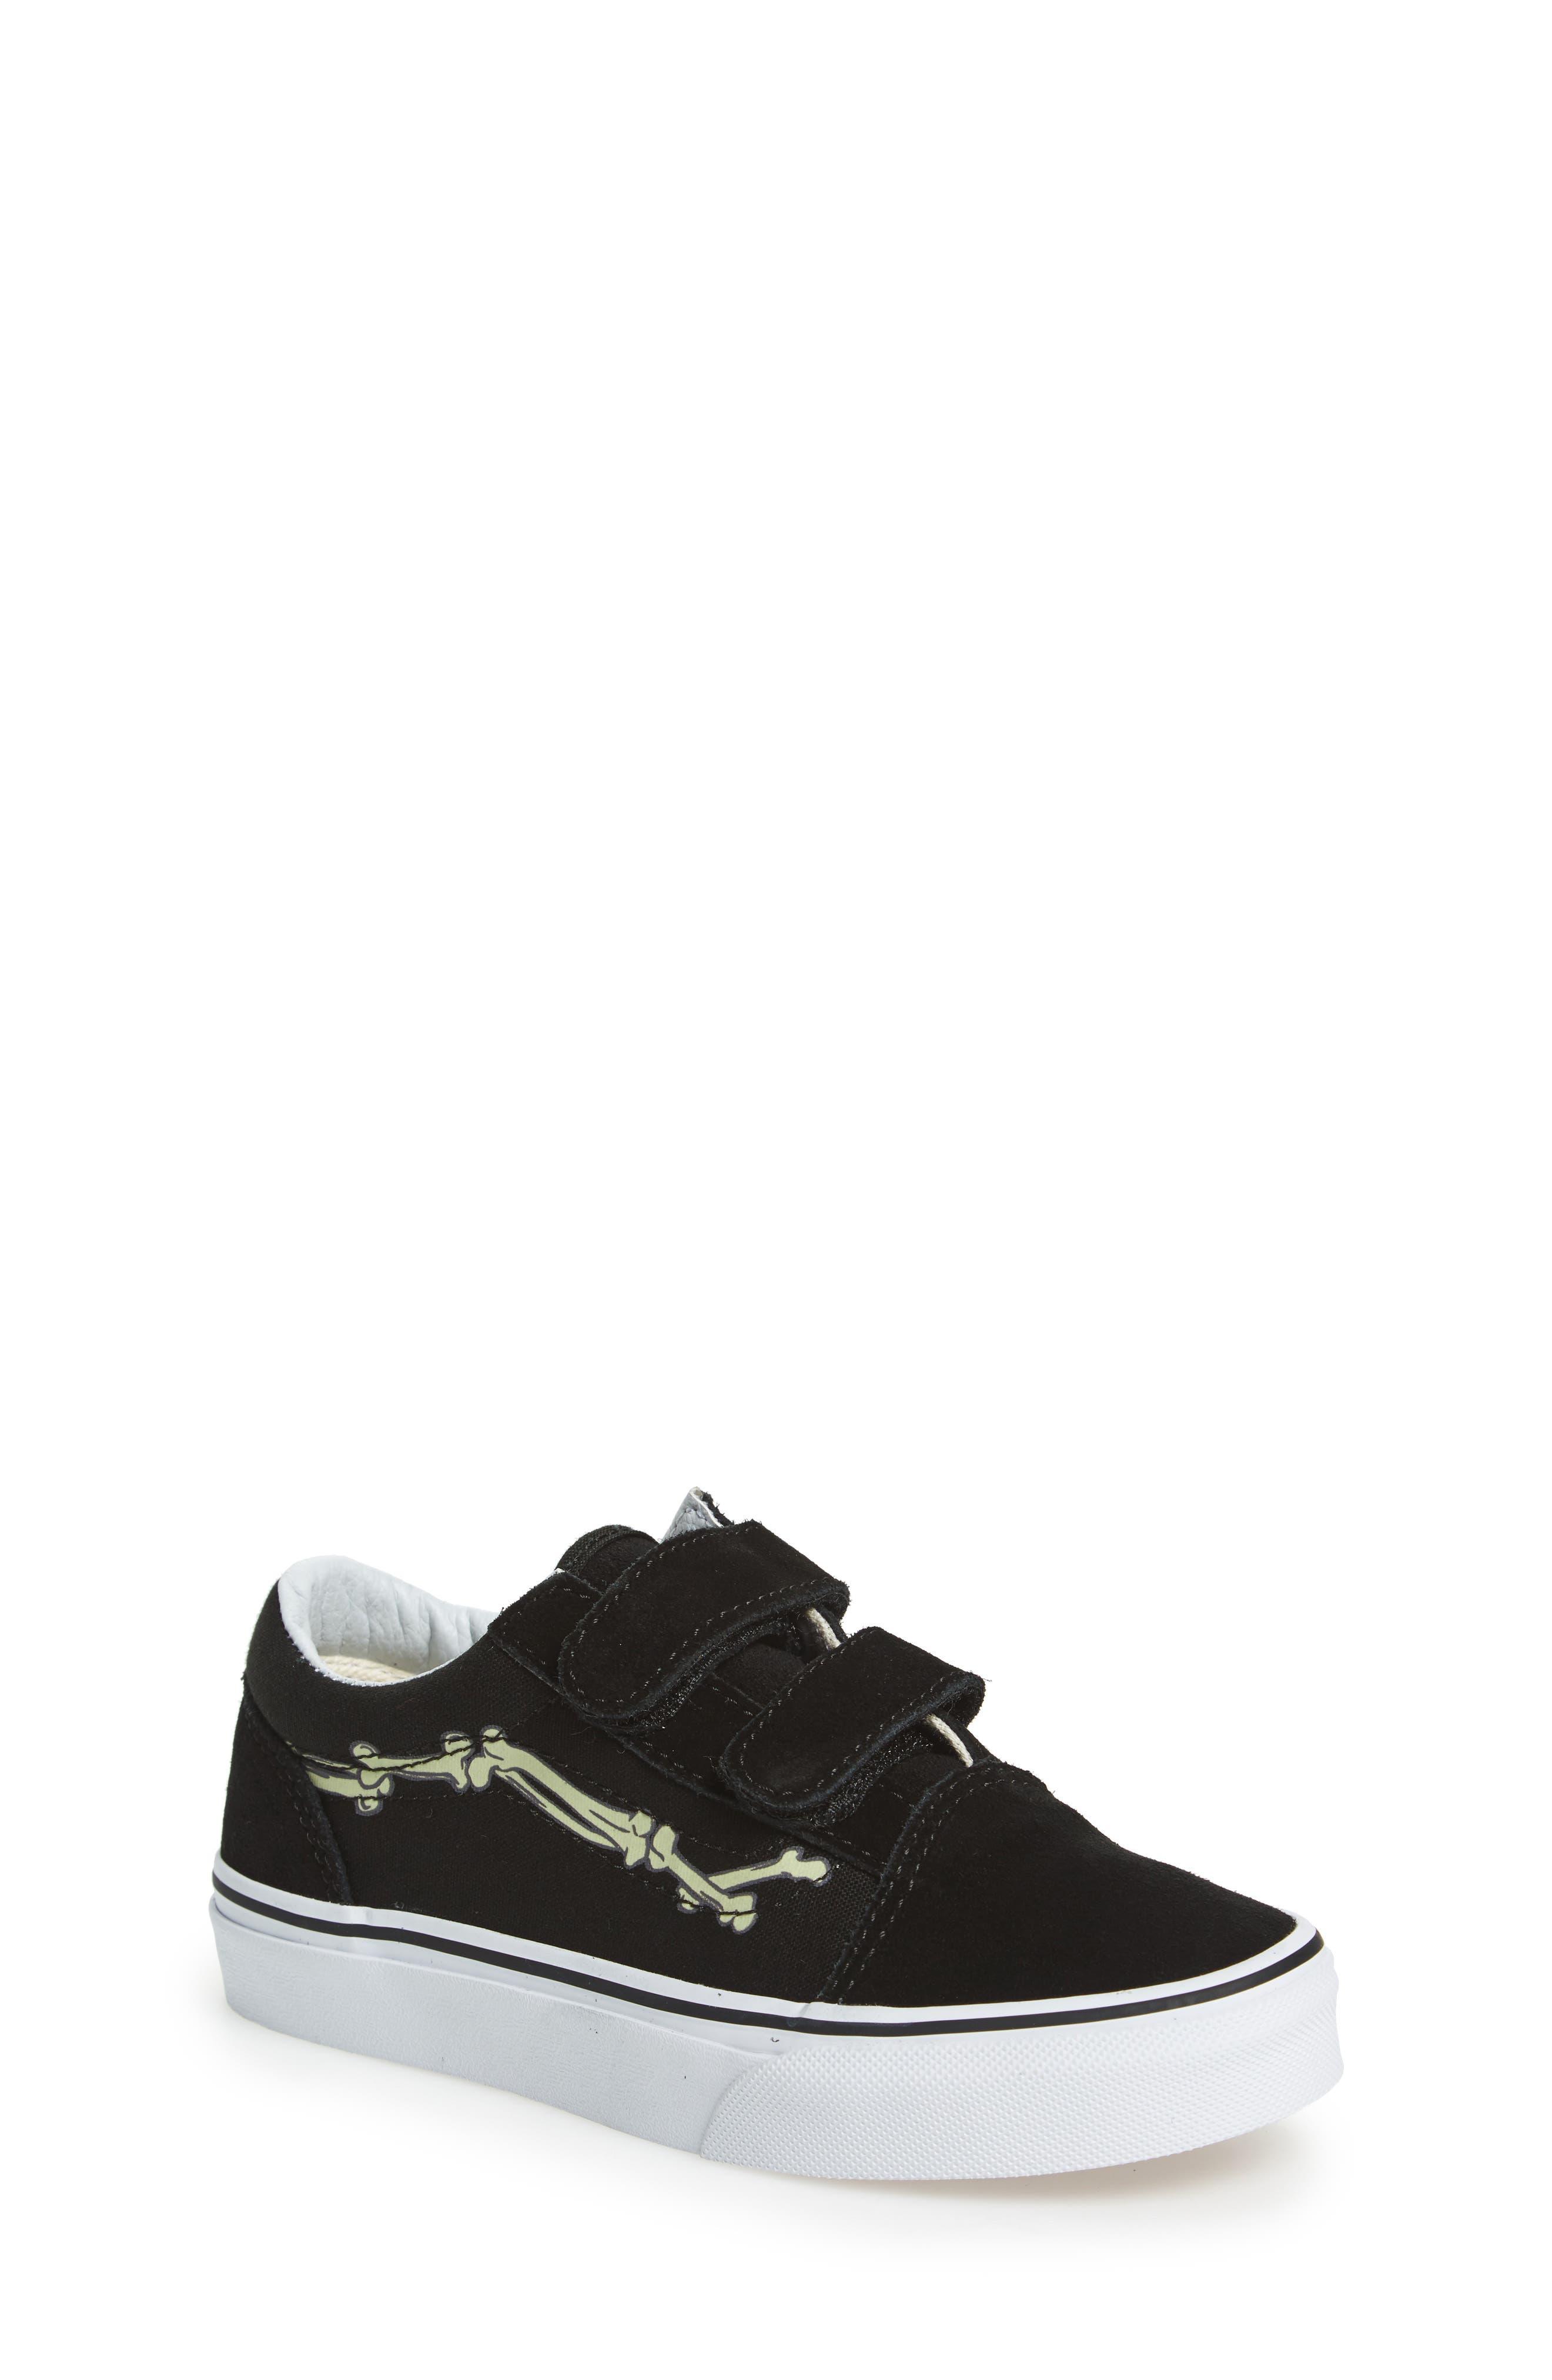 Old Skool Skate Sneaker,                         Main,                         color, 001